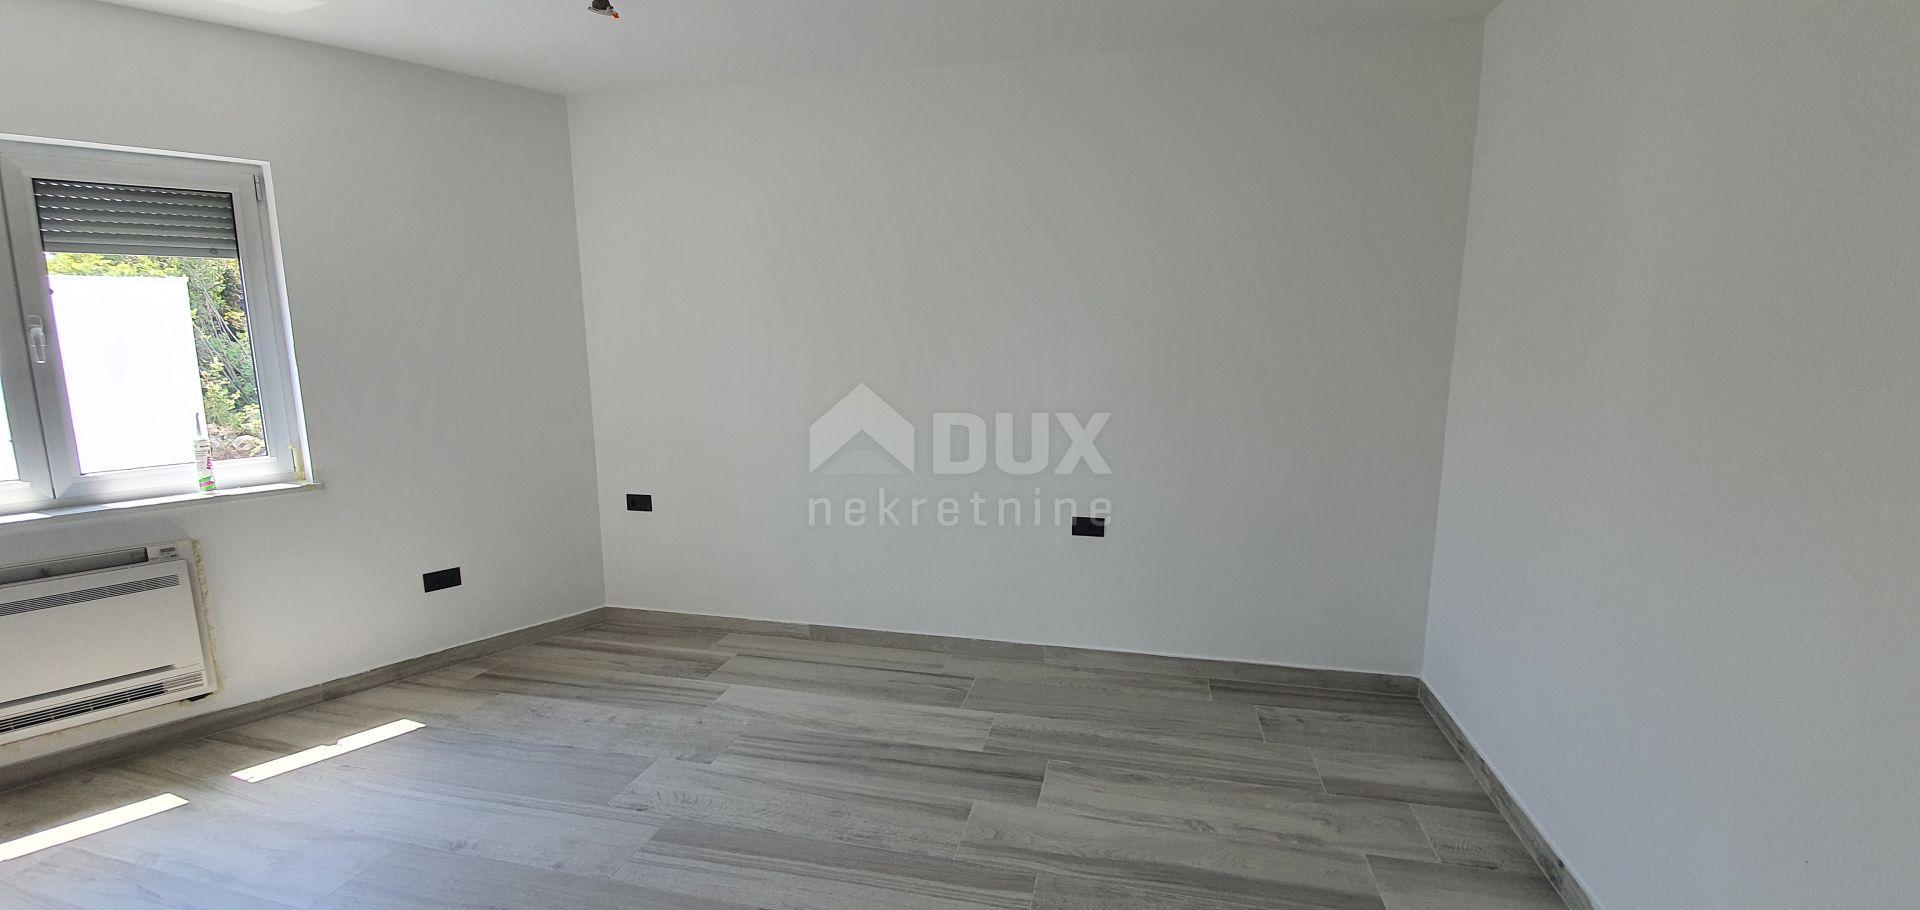 Appartamento Opatija - Centar, Opatija, 150m2